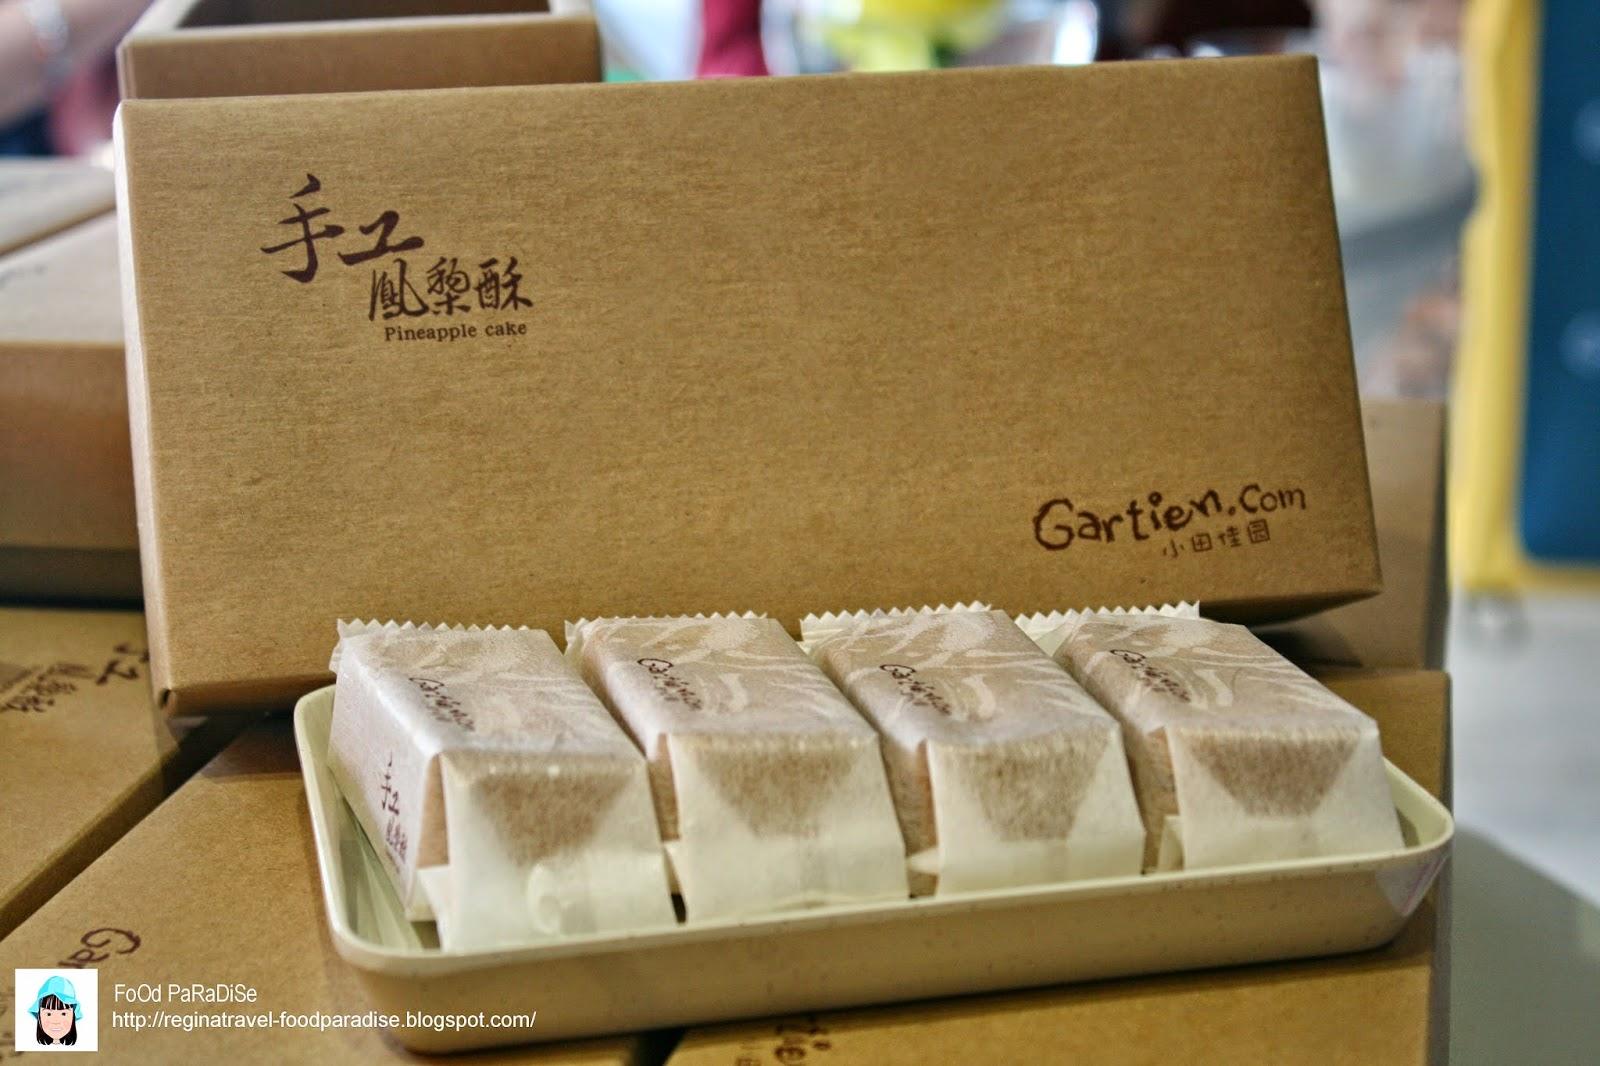 GARTIEN PINEAPPLE CAKES (小田佳園鳳梨酥)